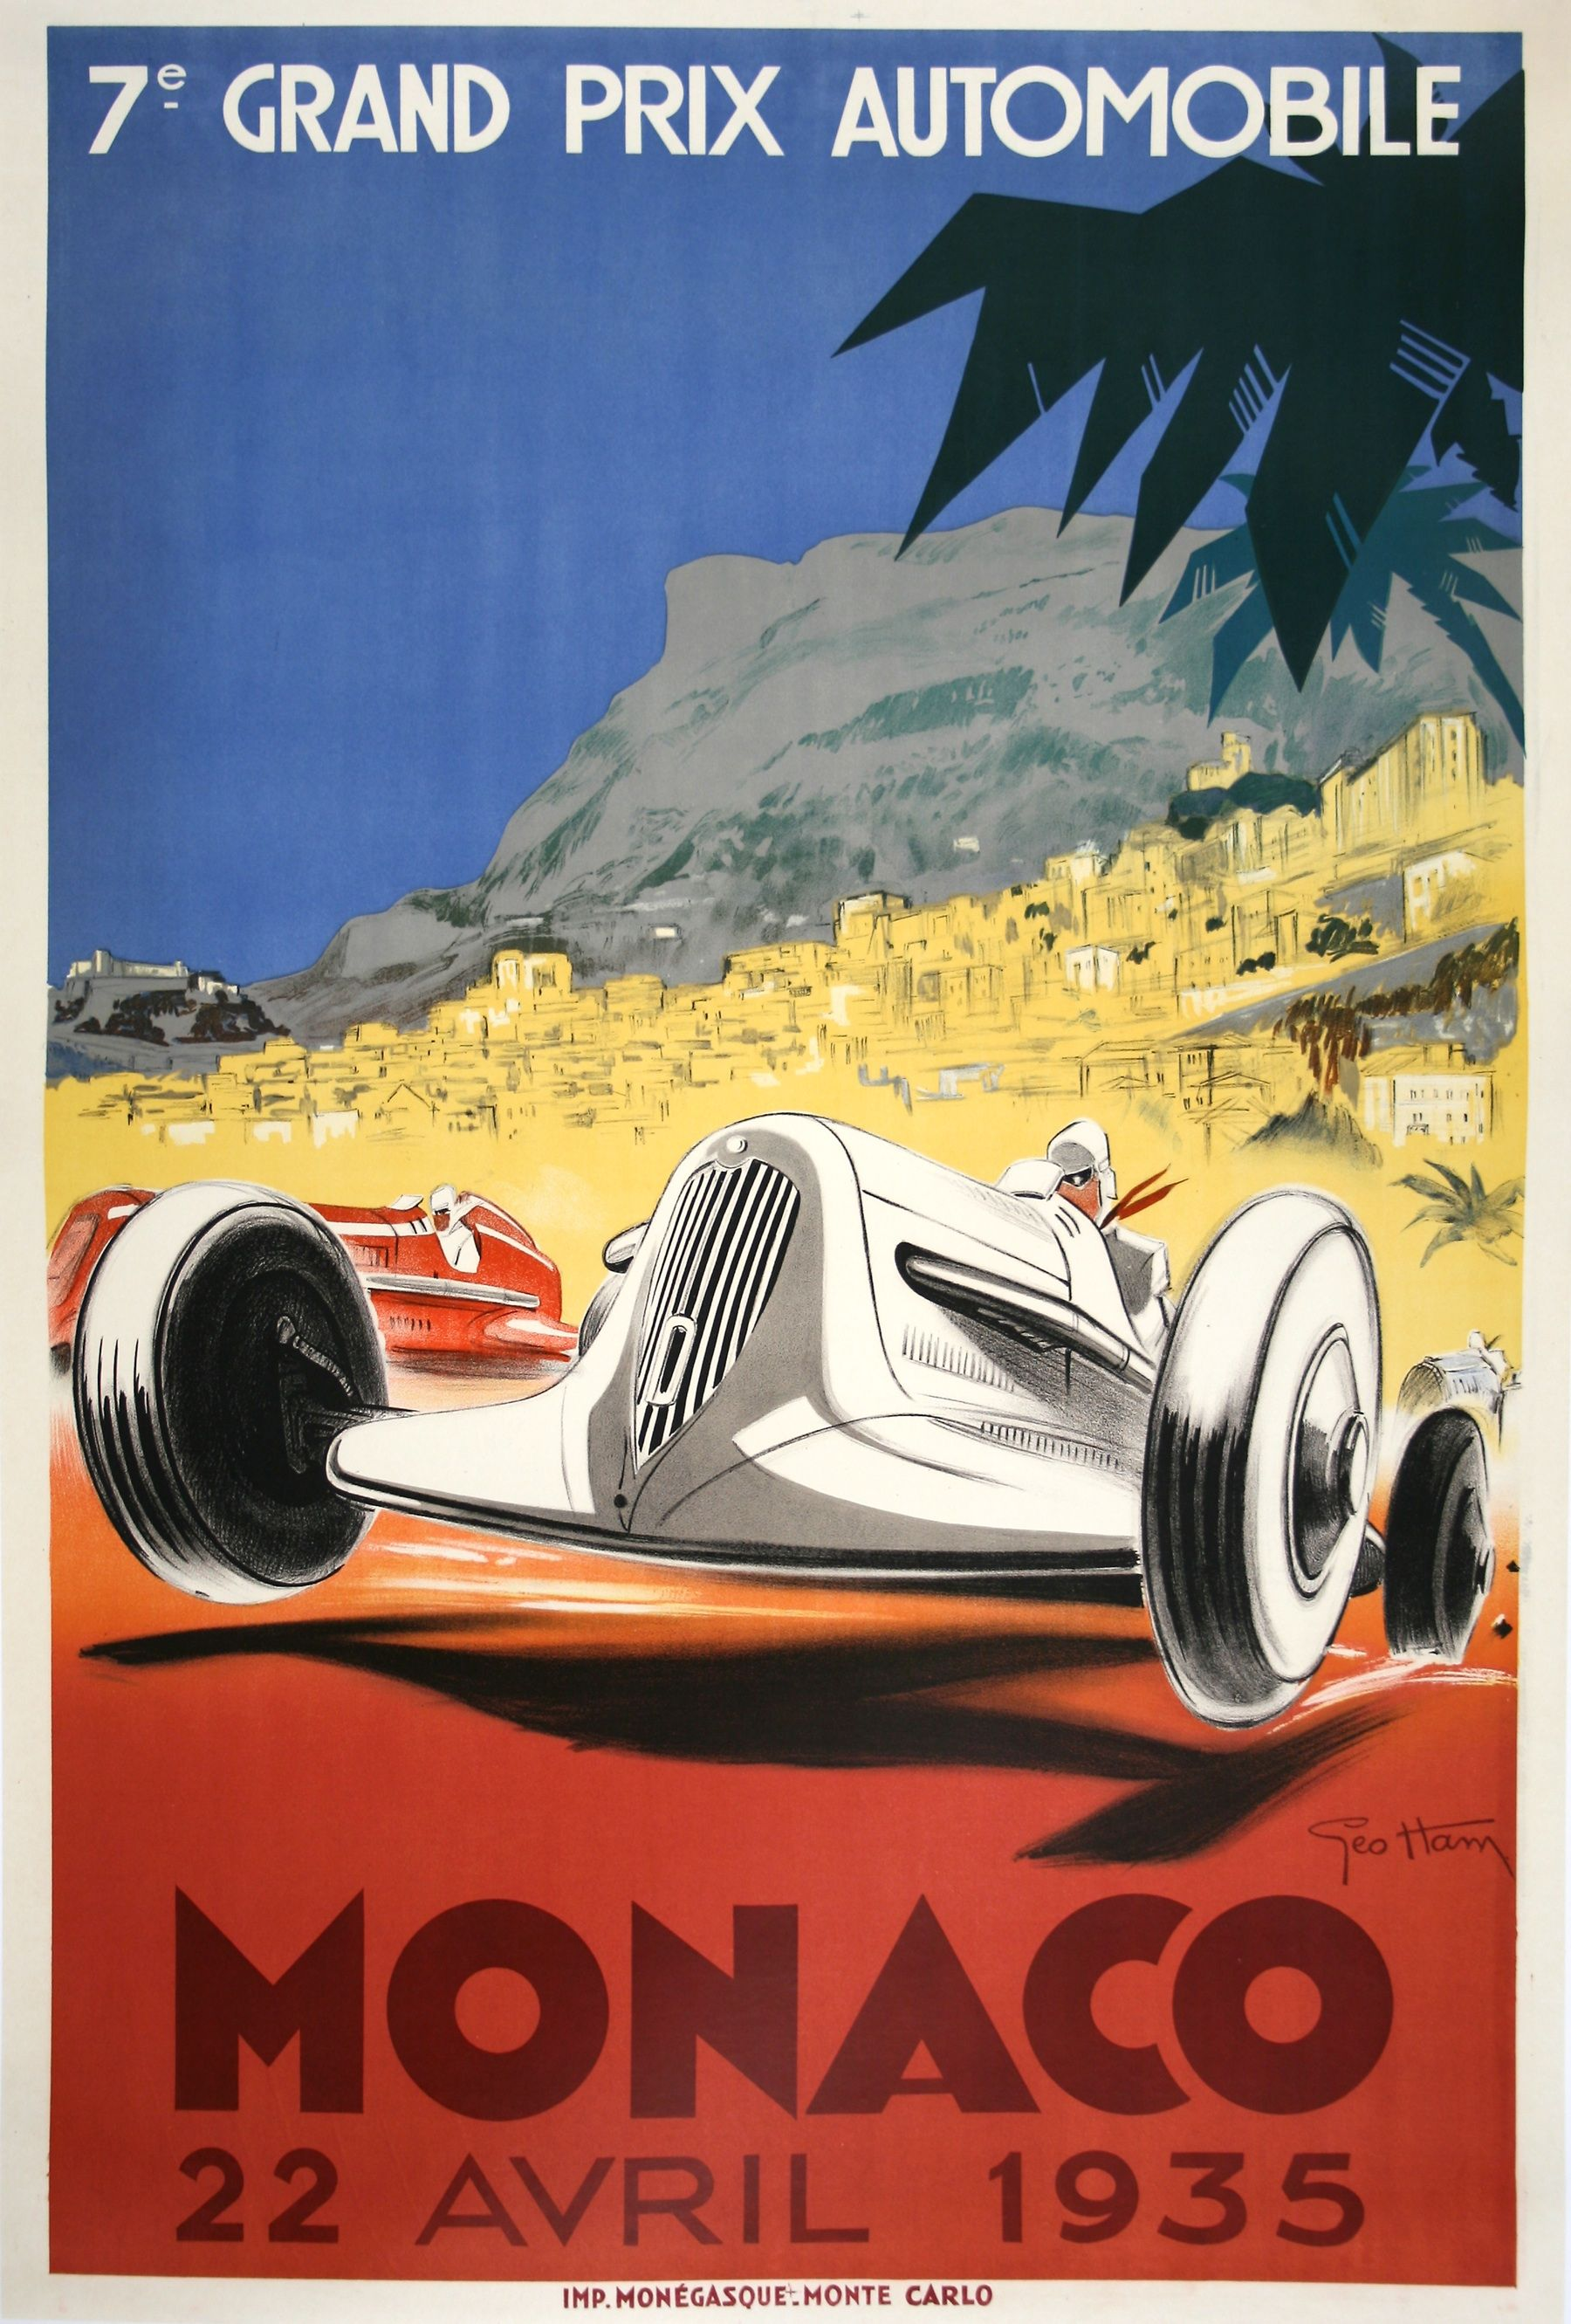 1952 Monaco Grand Prix Motor Racing Poster  A2 Reprint